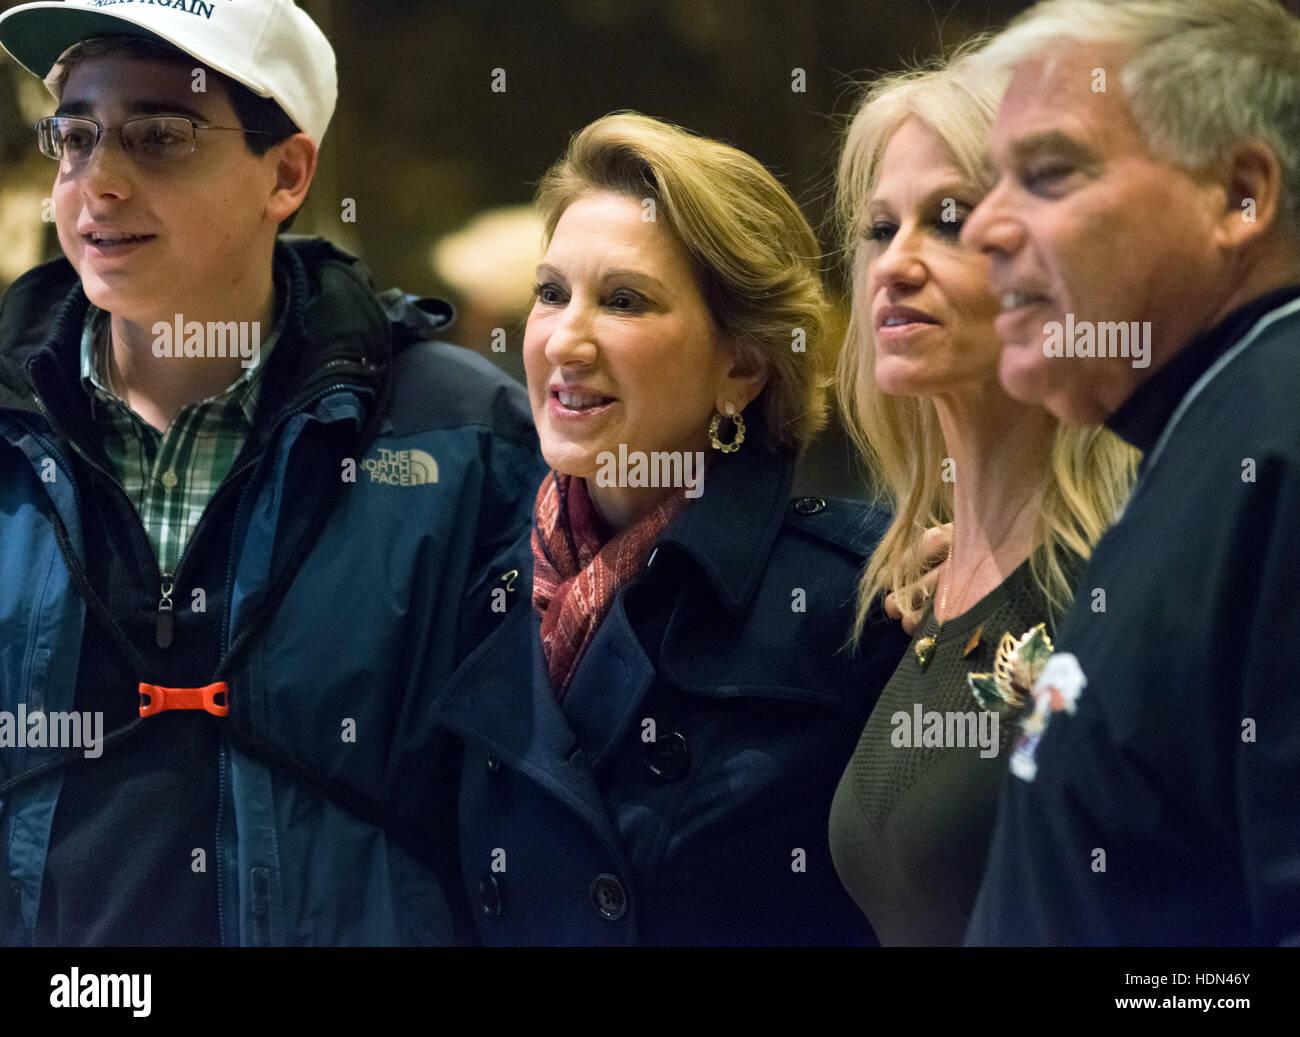 new york ny usa 12th dec 2016 former republican presidential